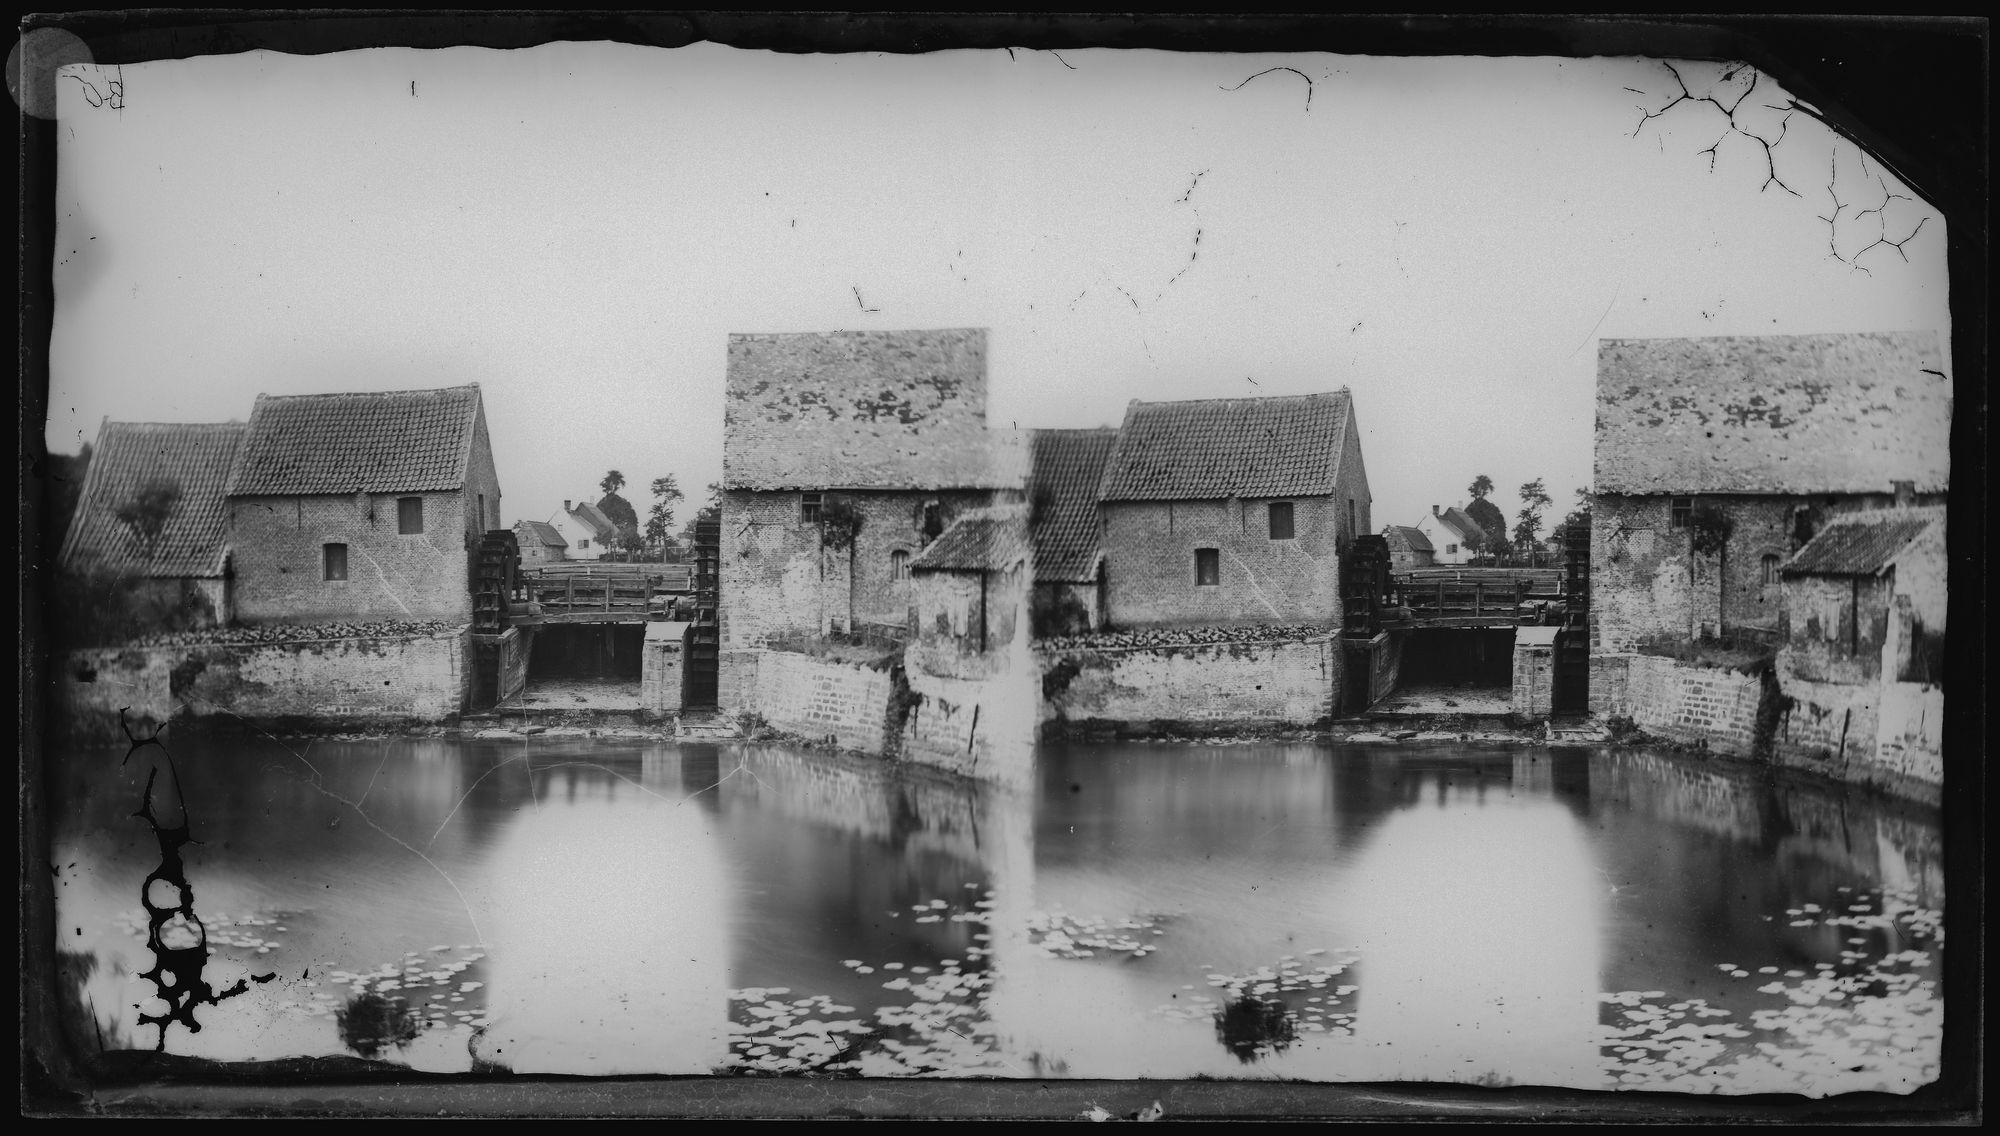 Heule-Watermolen circa 1863